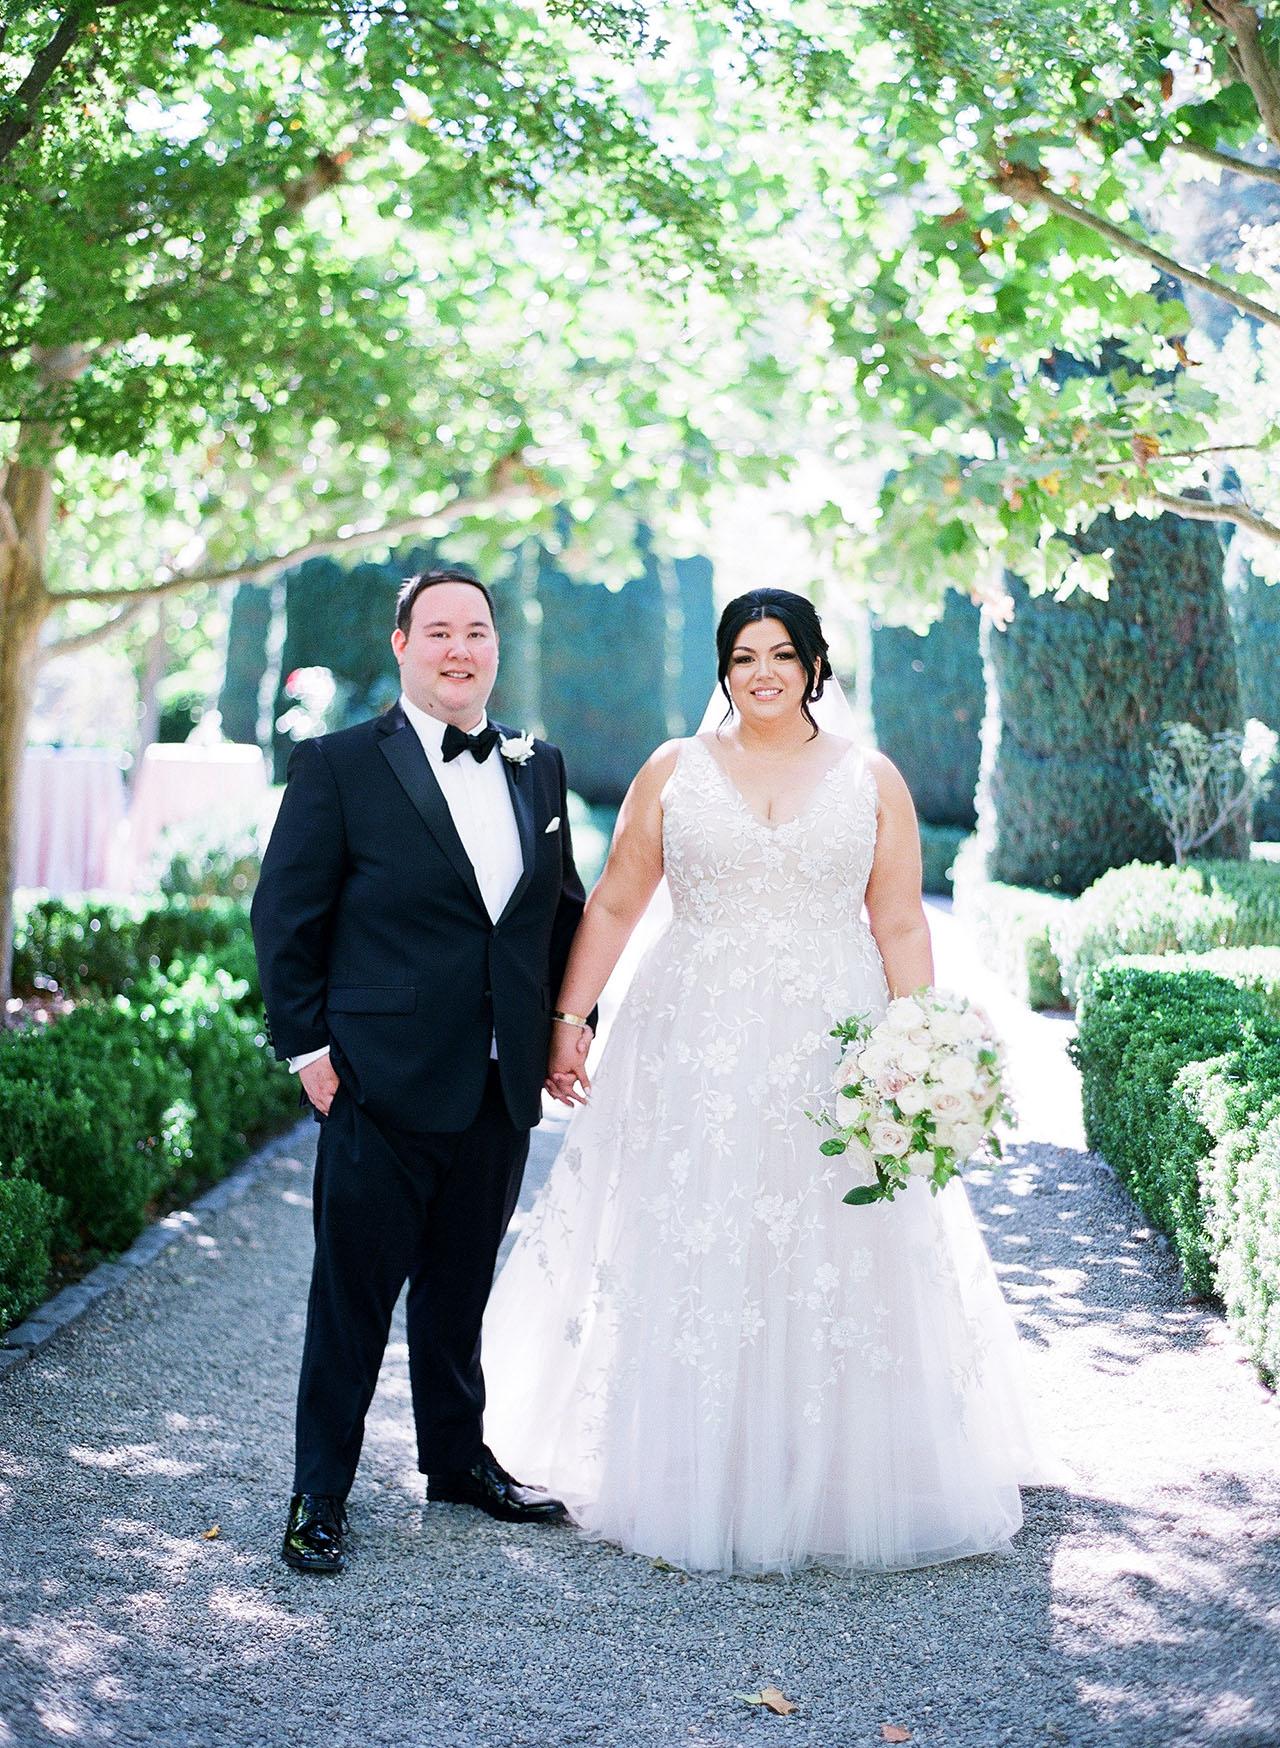 gillian tyler wedding couple posing holding hands